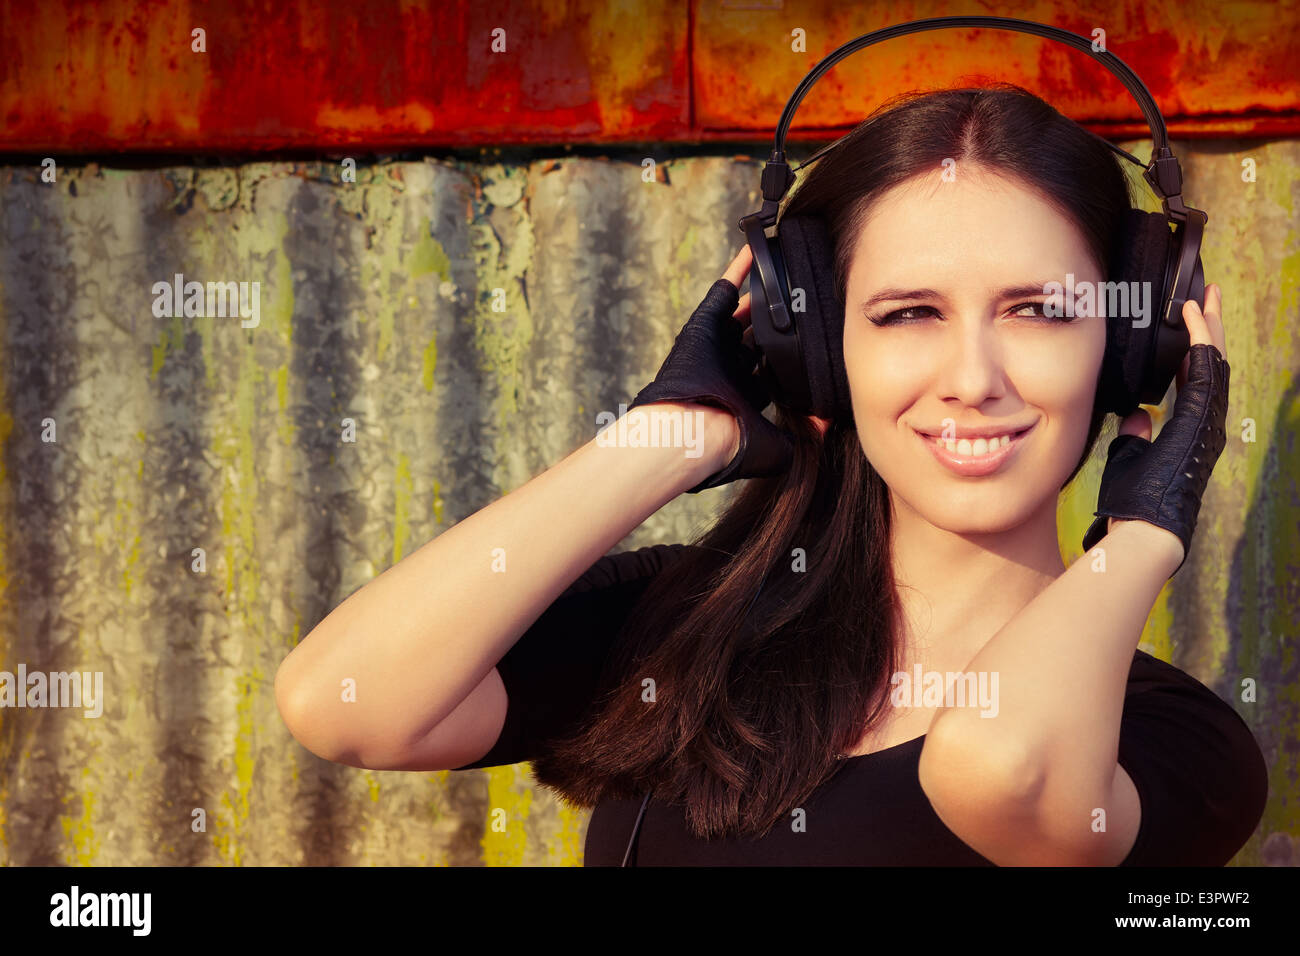 Girl with Big Headphones on Grunge Background - Stock Image